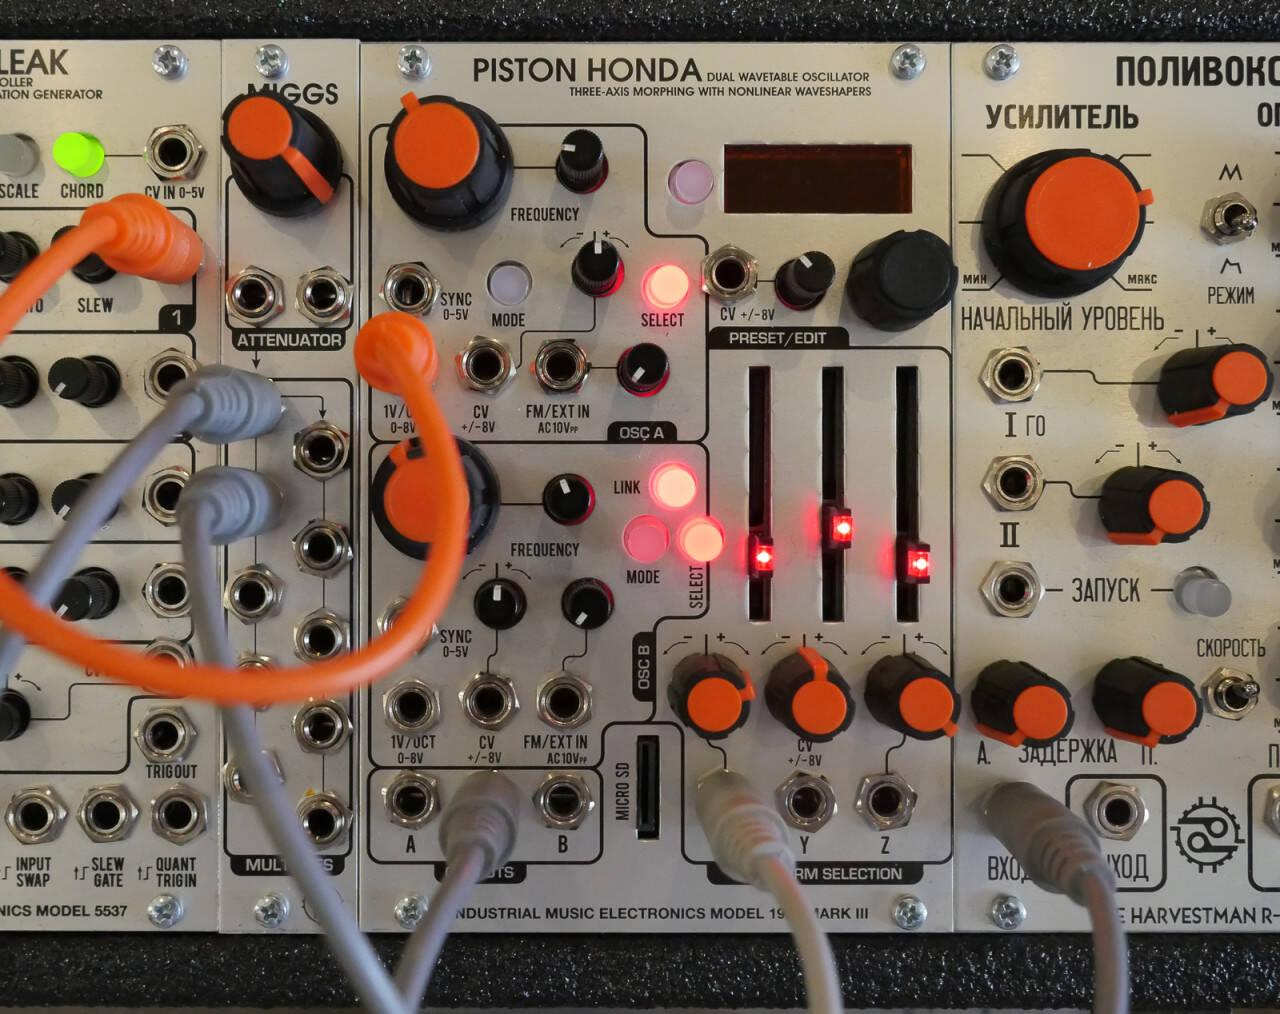 Industrial Music Electronics Piston Honda